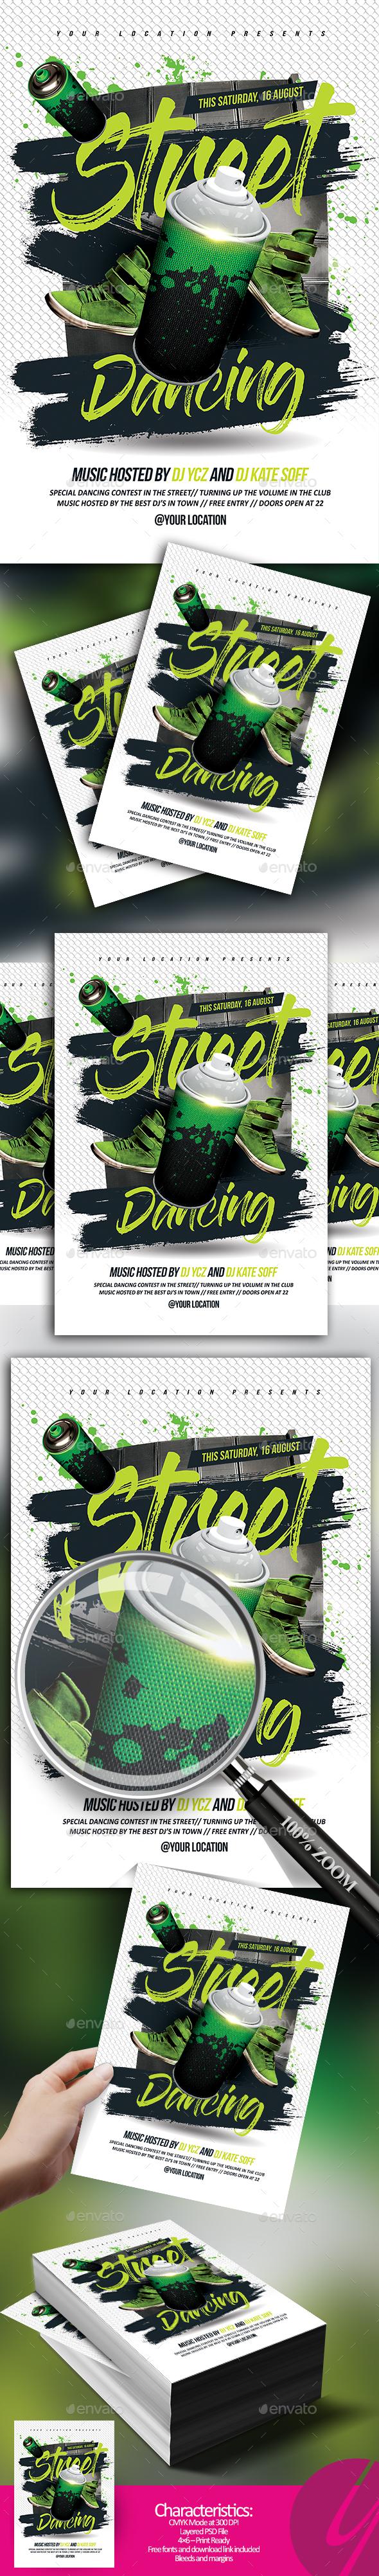 Street Dancing Flyer - Clubs & Parties Events